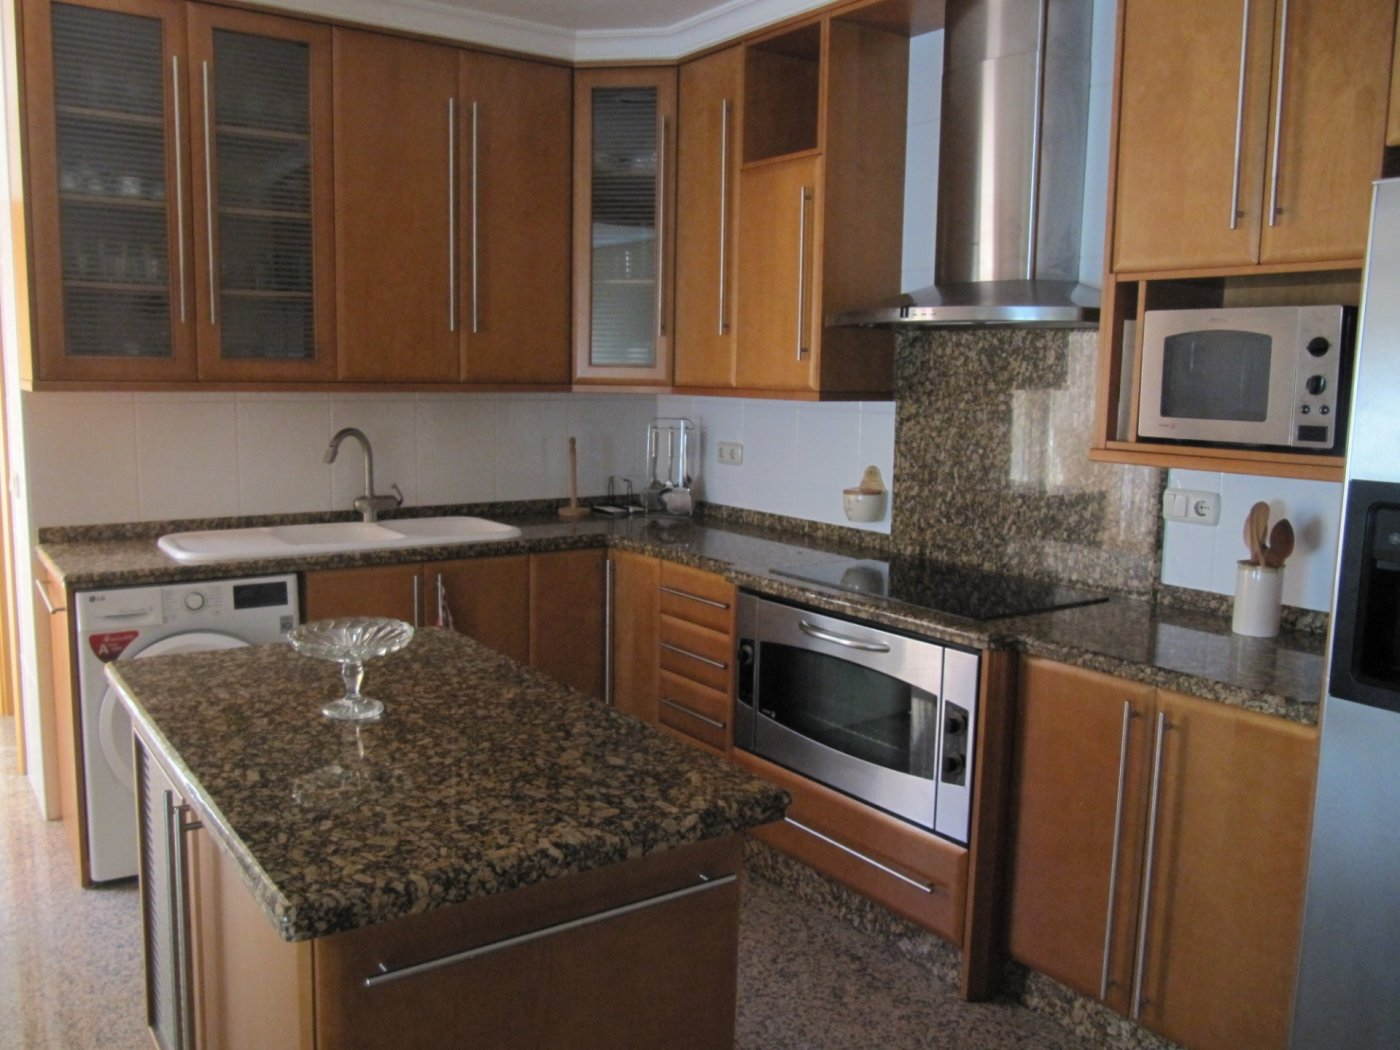 Ground Floor Apartment for rent in Casas del seÑor, Monovar